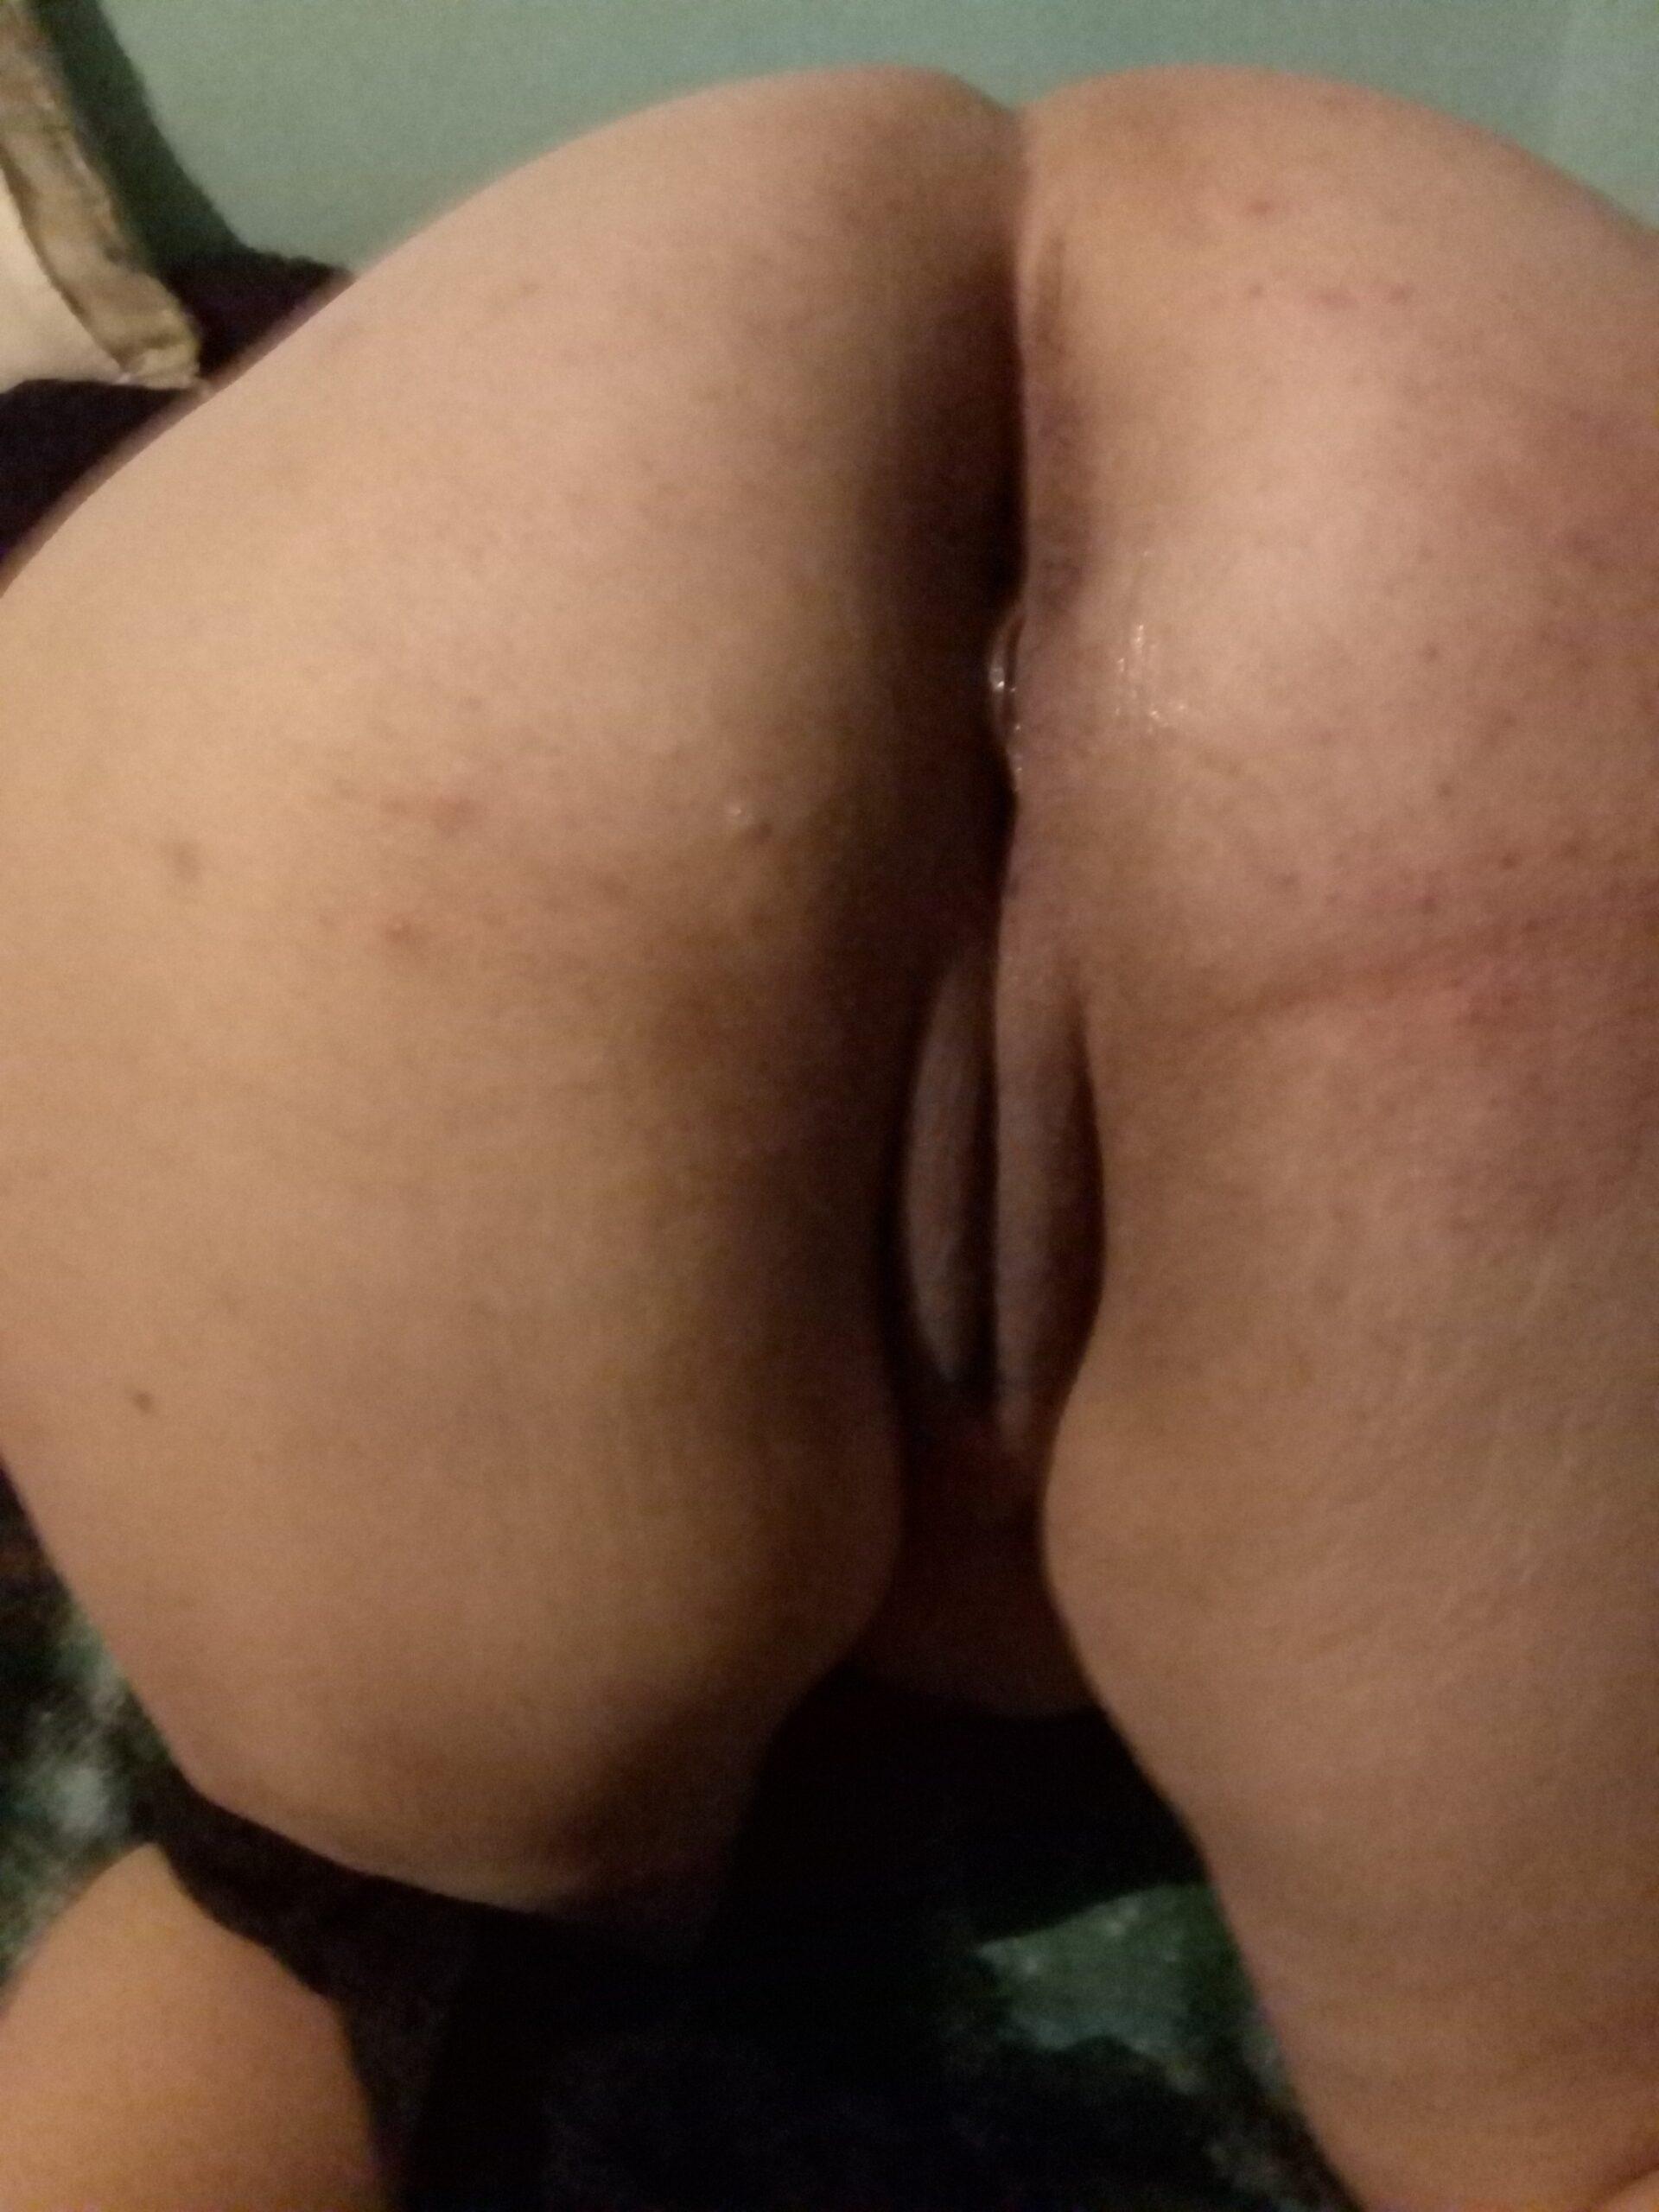 fotos porno esposas